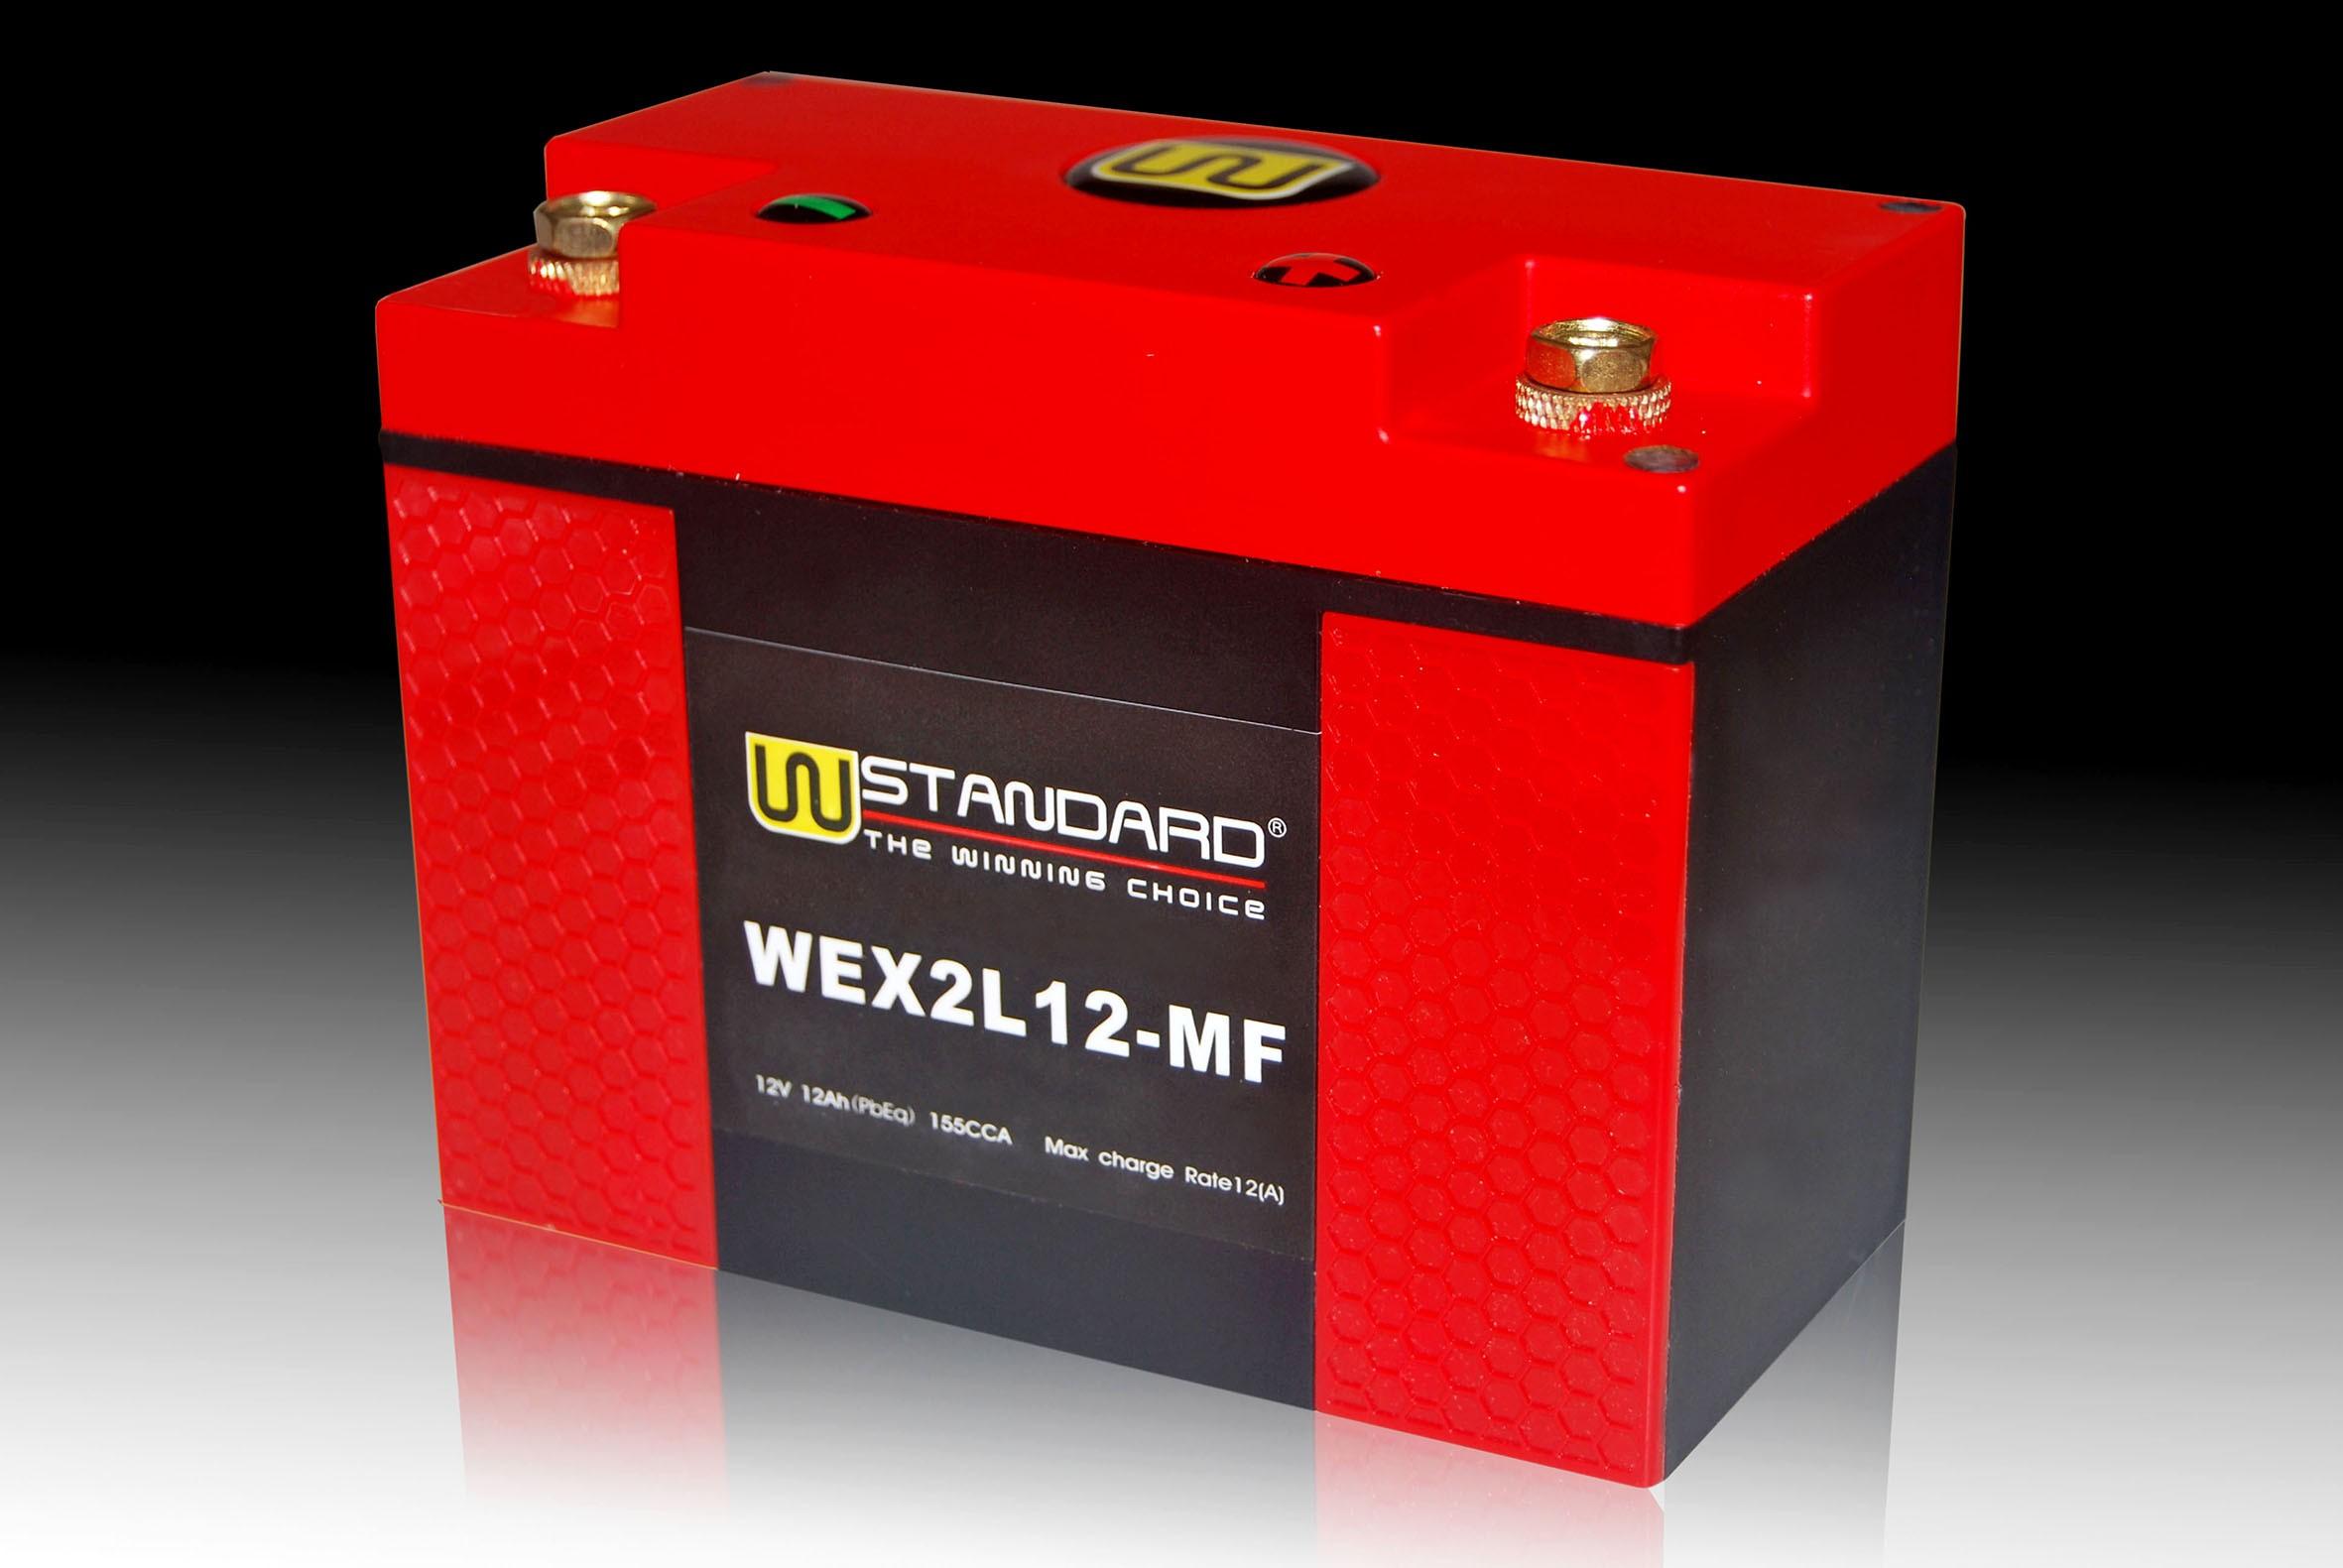 WEX2L12-MF